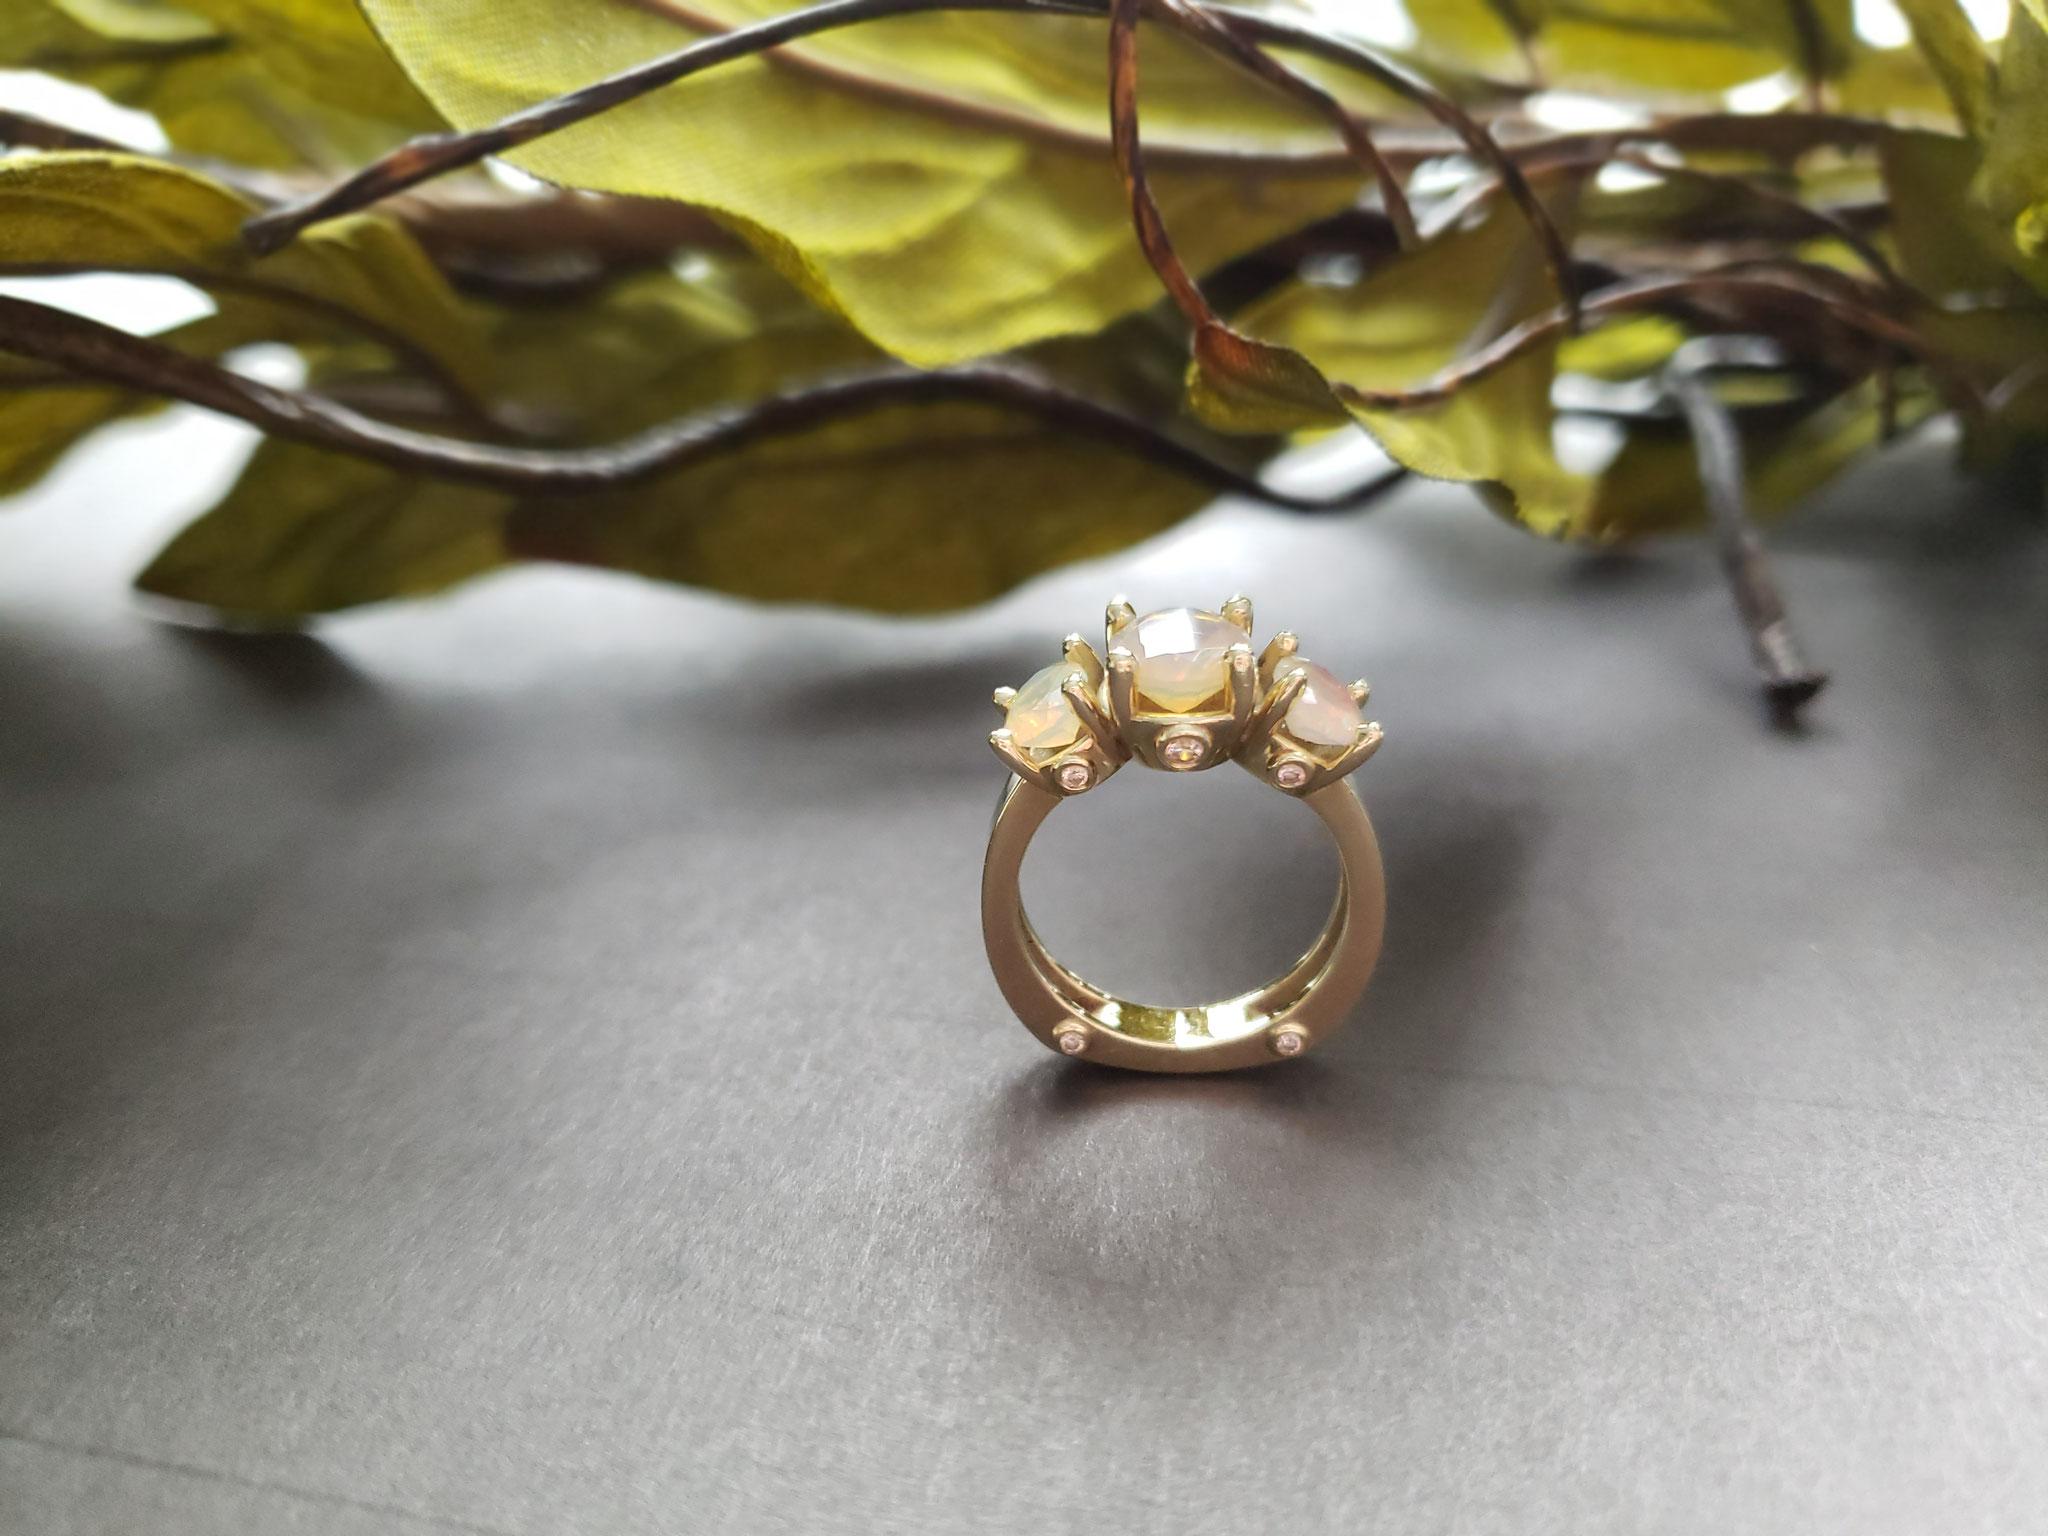 3 stone ethiopian opal ring in 14K green gold